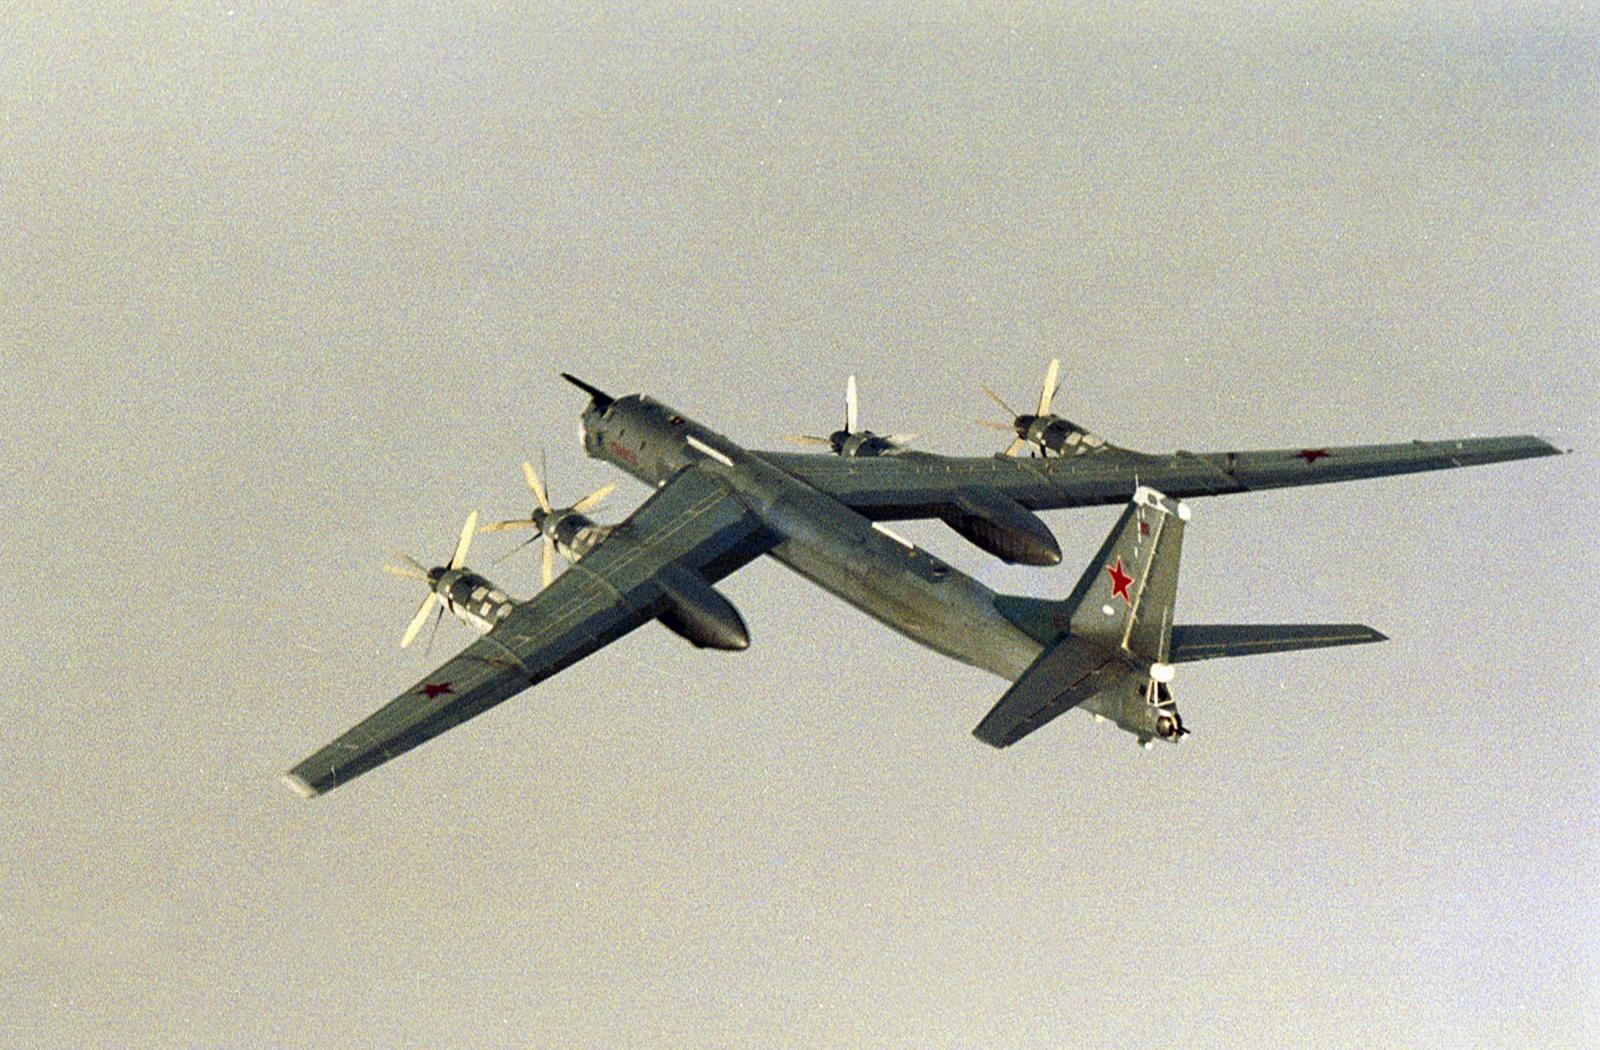 A Russian Tupolev Tu-95 plane